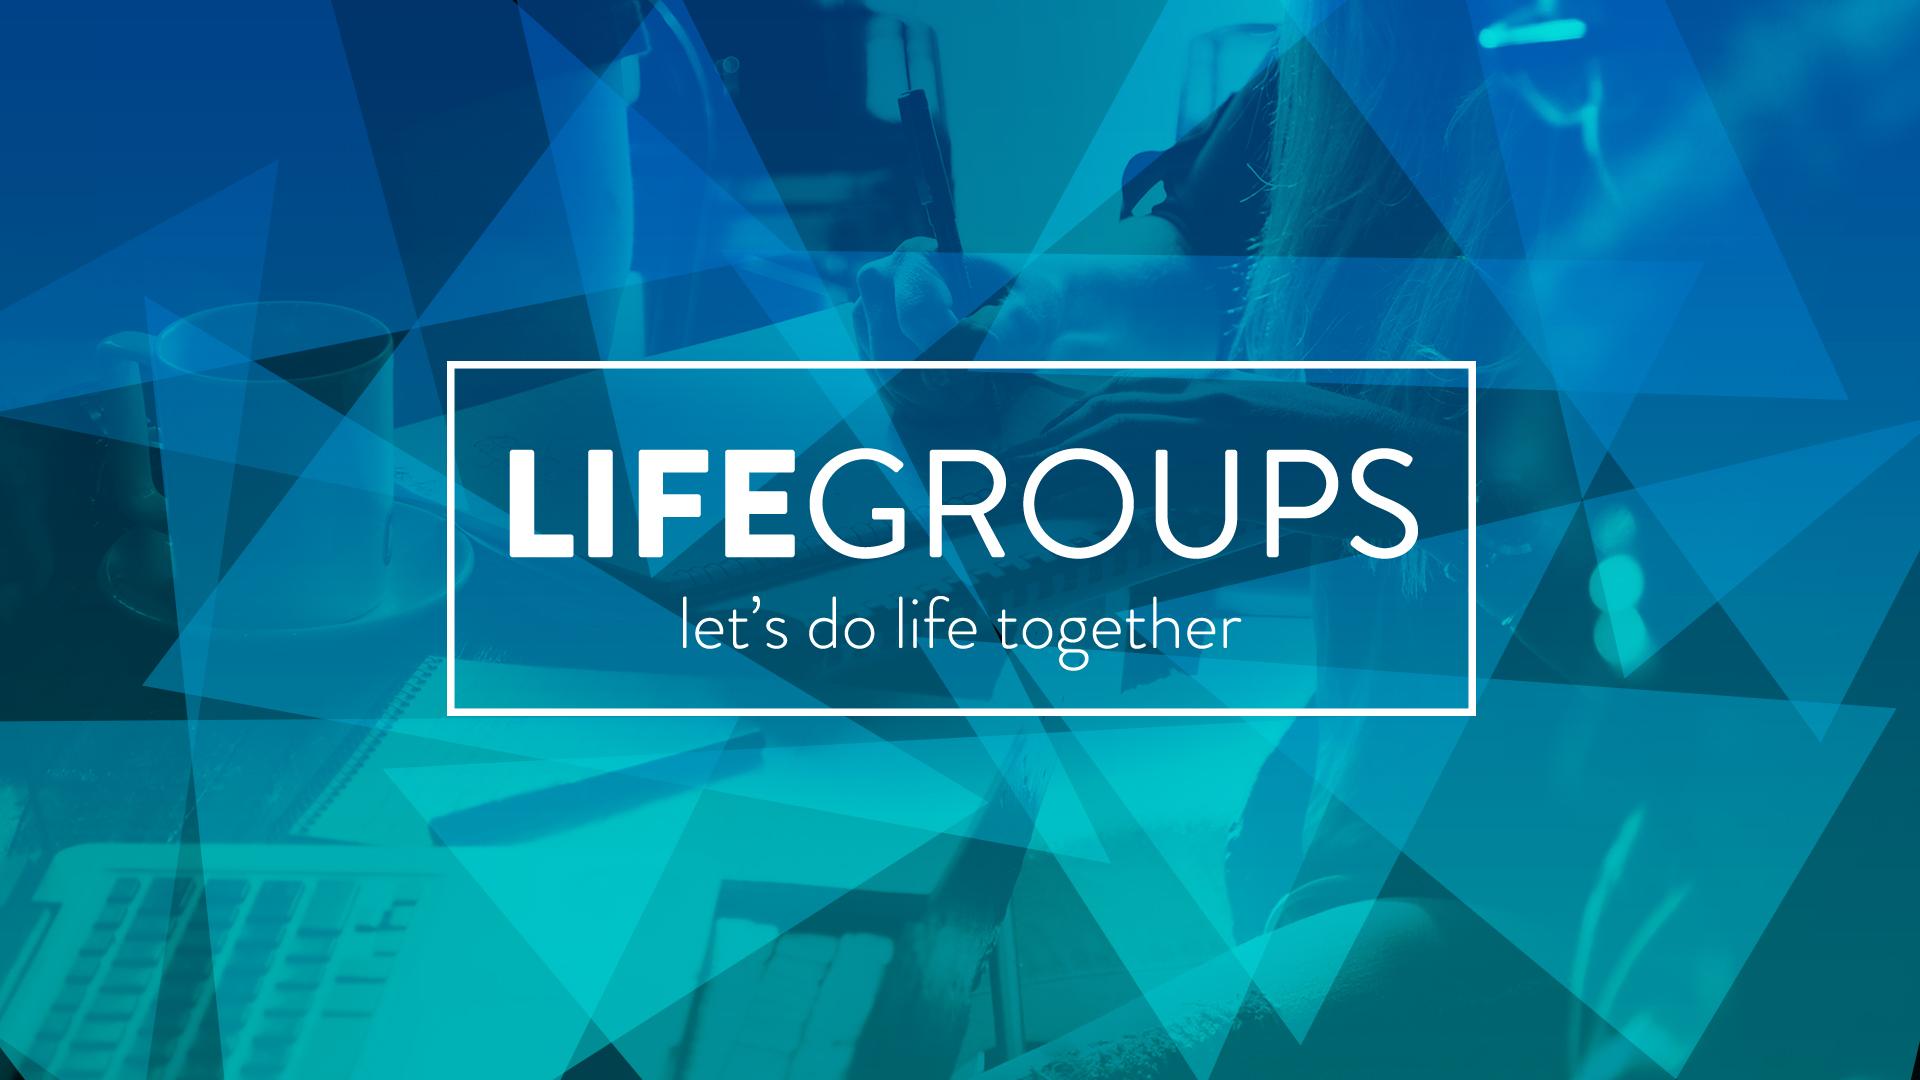 lifegroupsweb.jpg